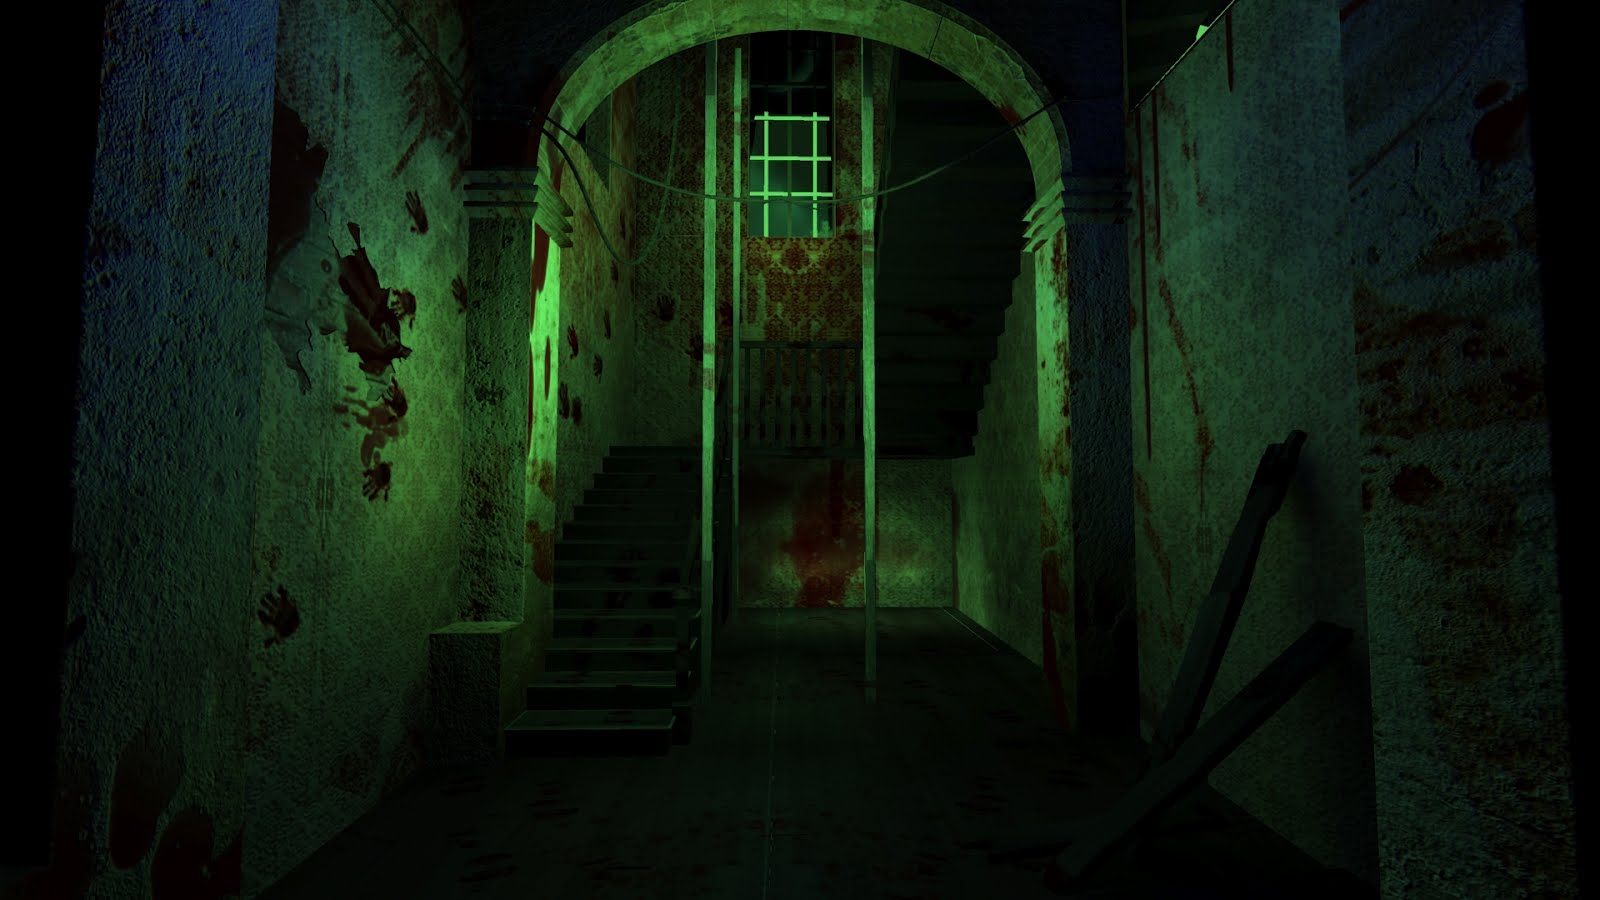 haunted mansion wallpaper pattern